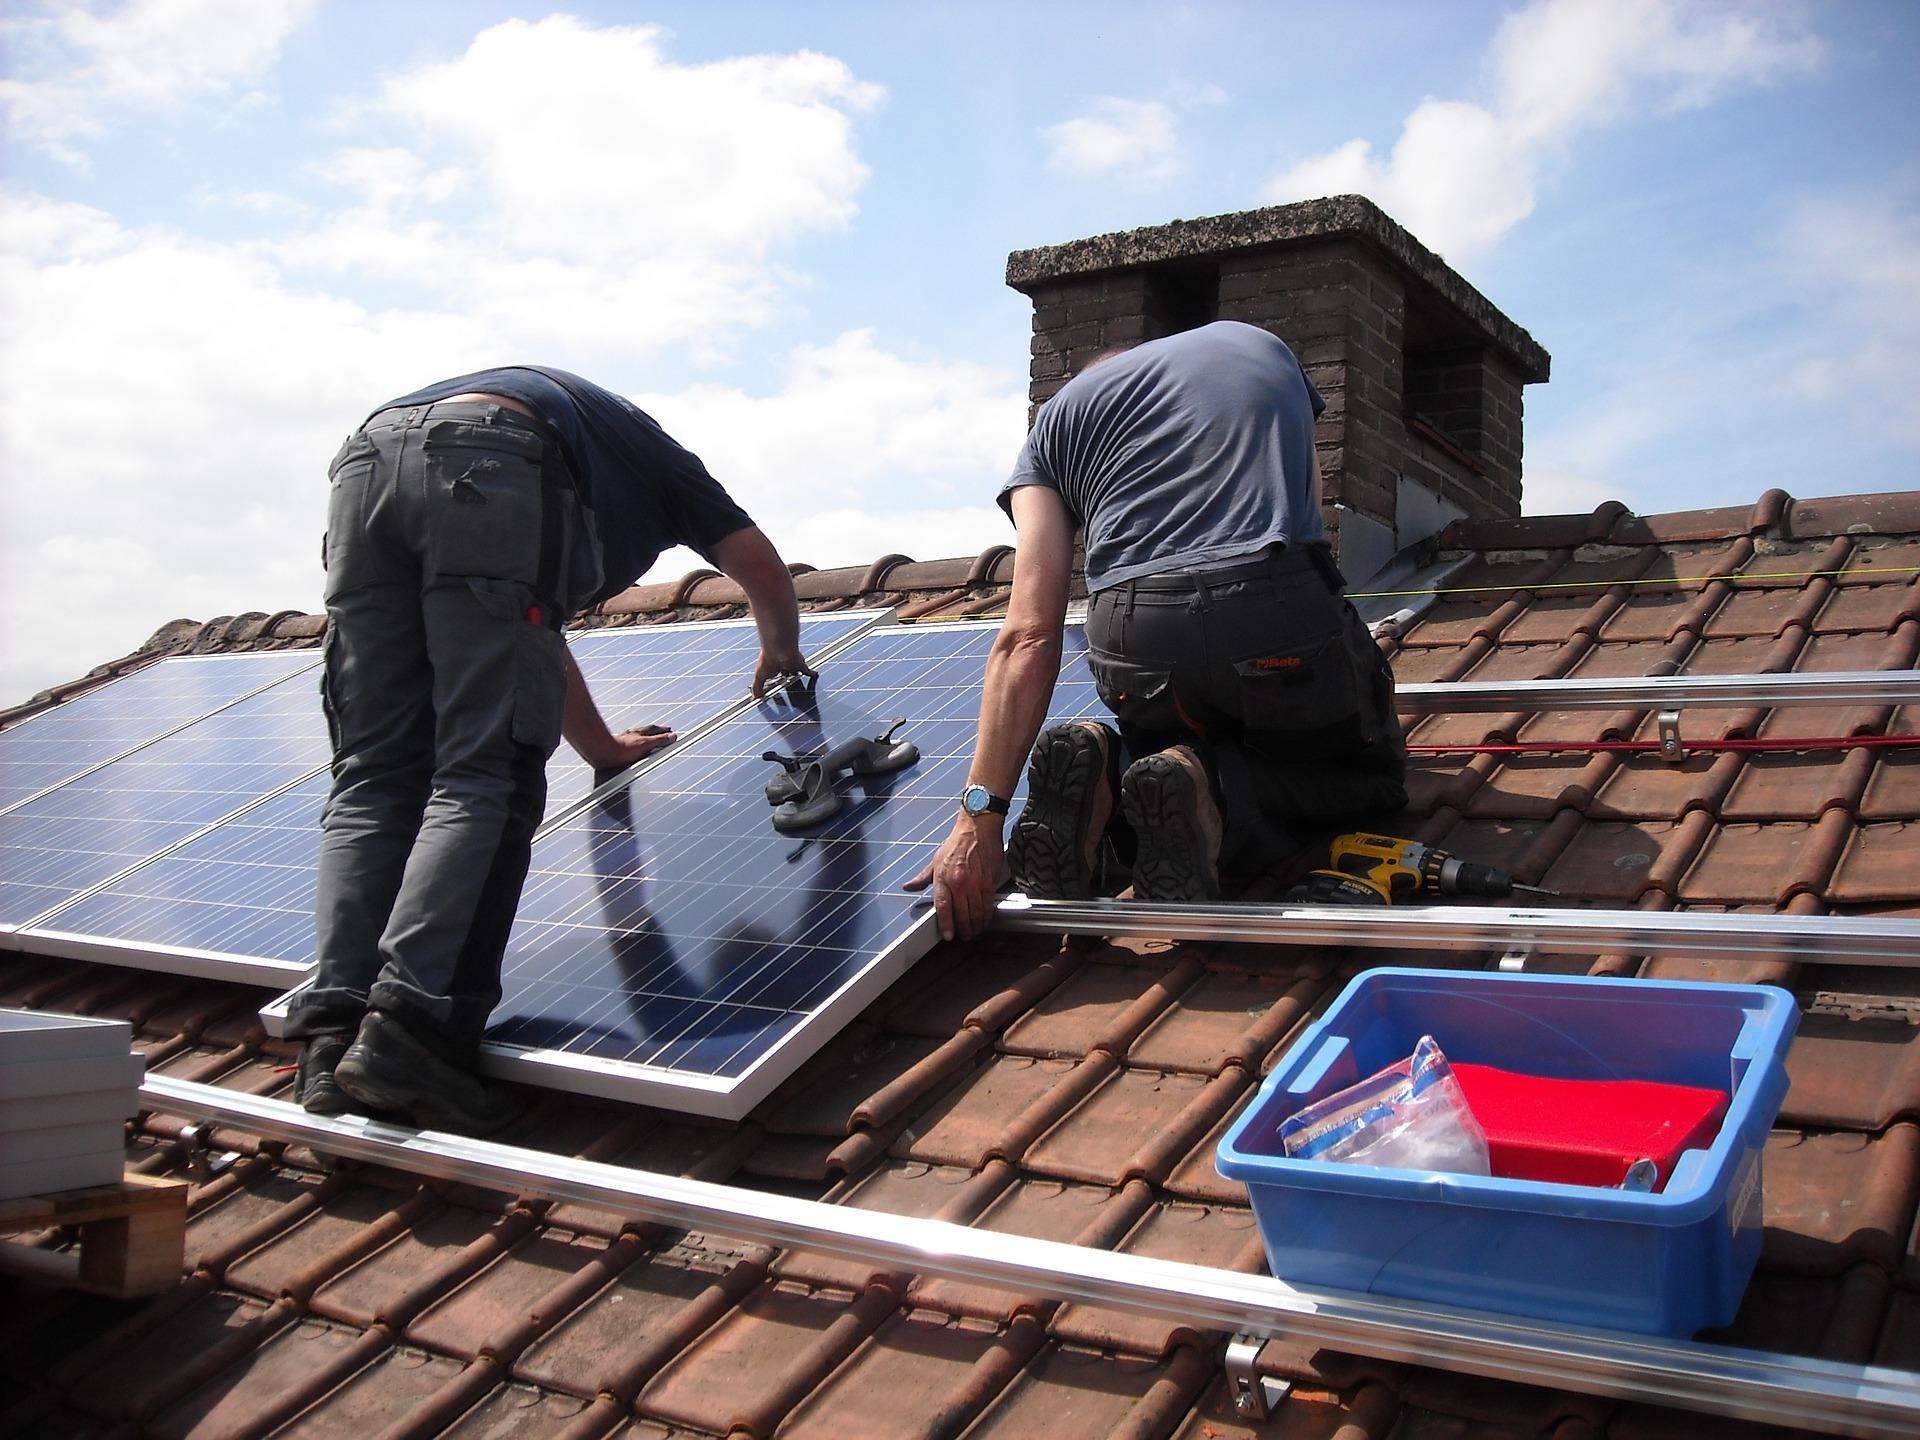 Eco-friendly home upgrades trending across U.S.